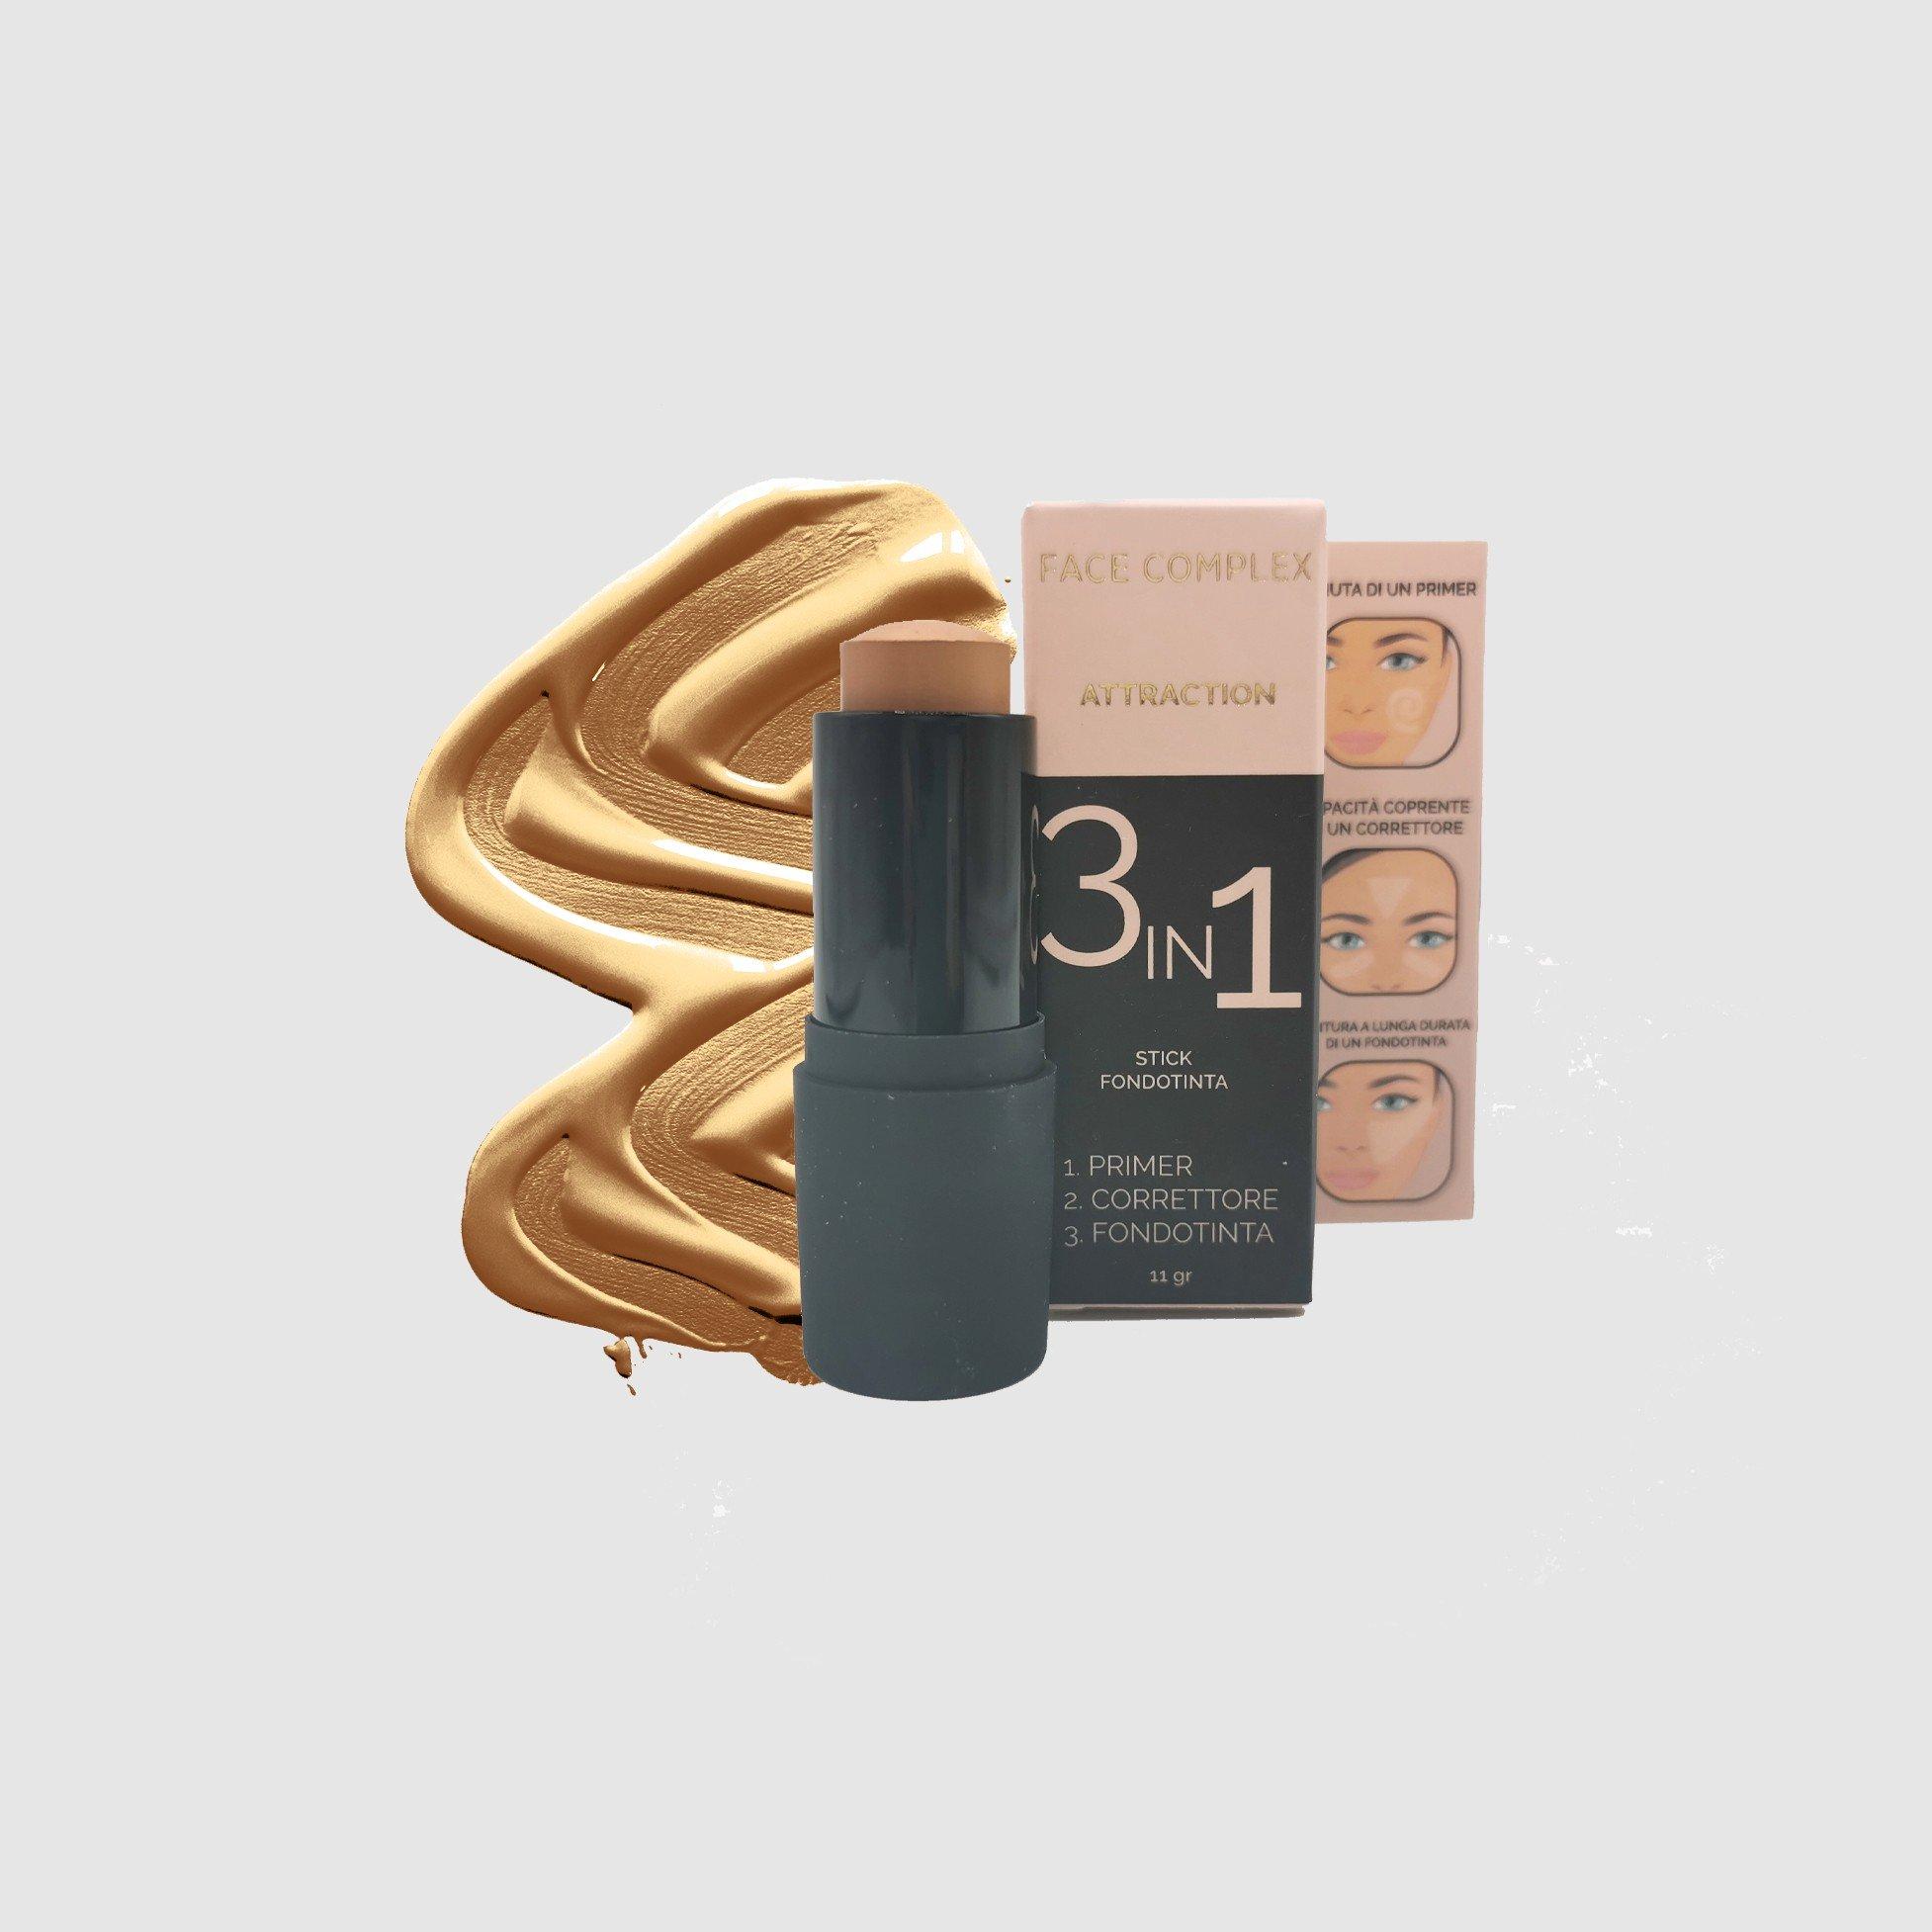 Fondotinta 3in1 Stick 11gr Face Complex Cosmetics